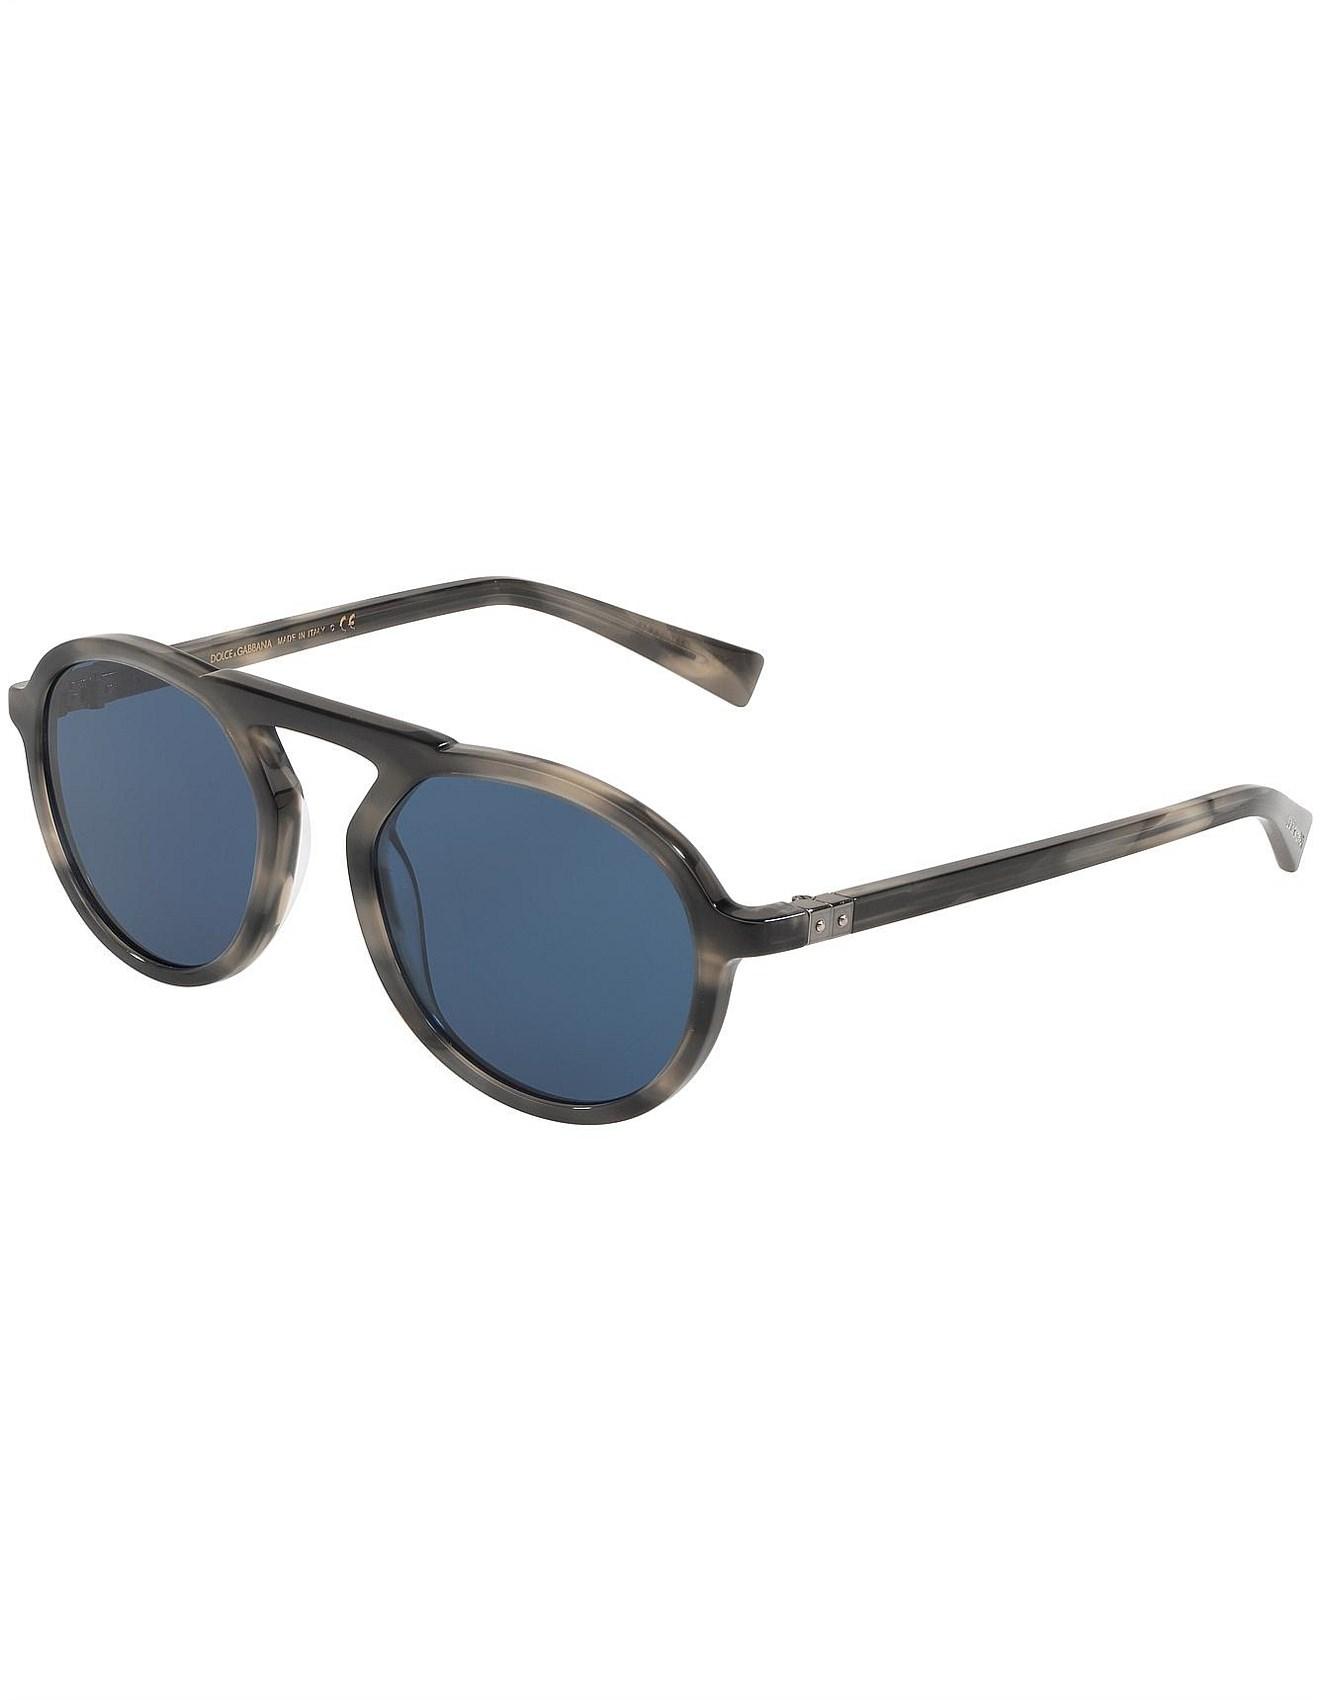 7b5ae85ca24 Phantos Sunglasses. 1  2. Zoom. Dolce   Gabbana